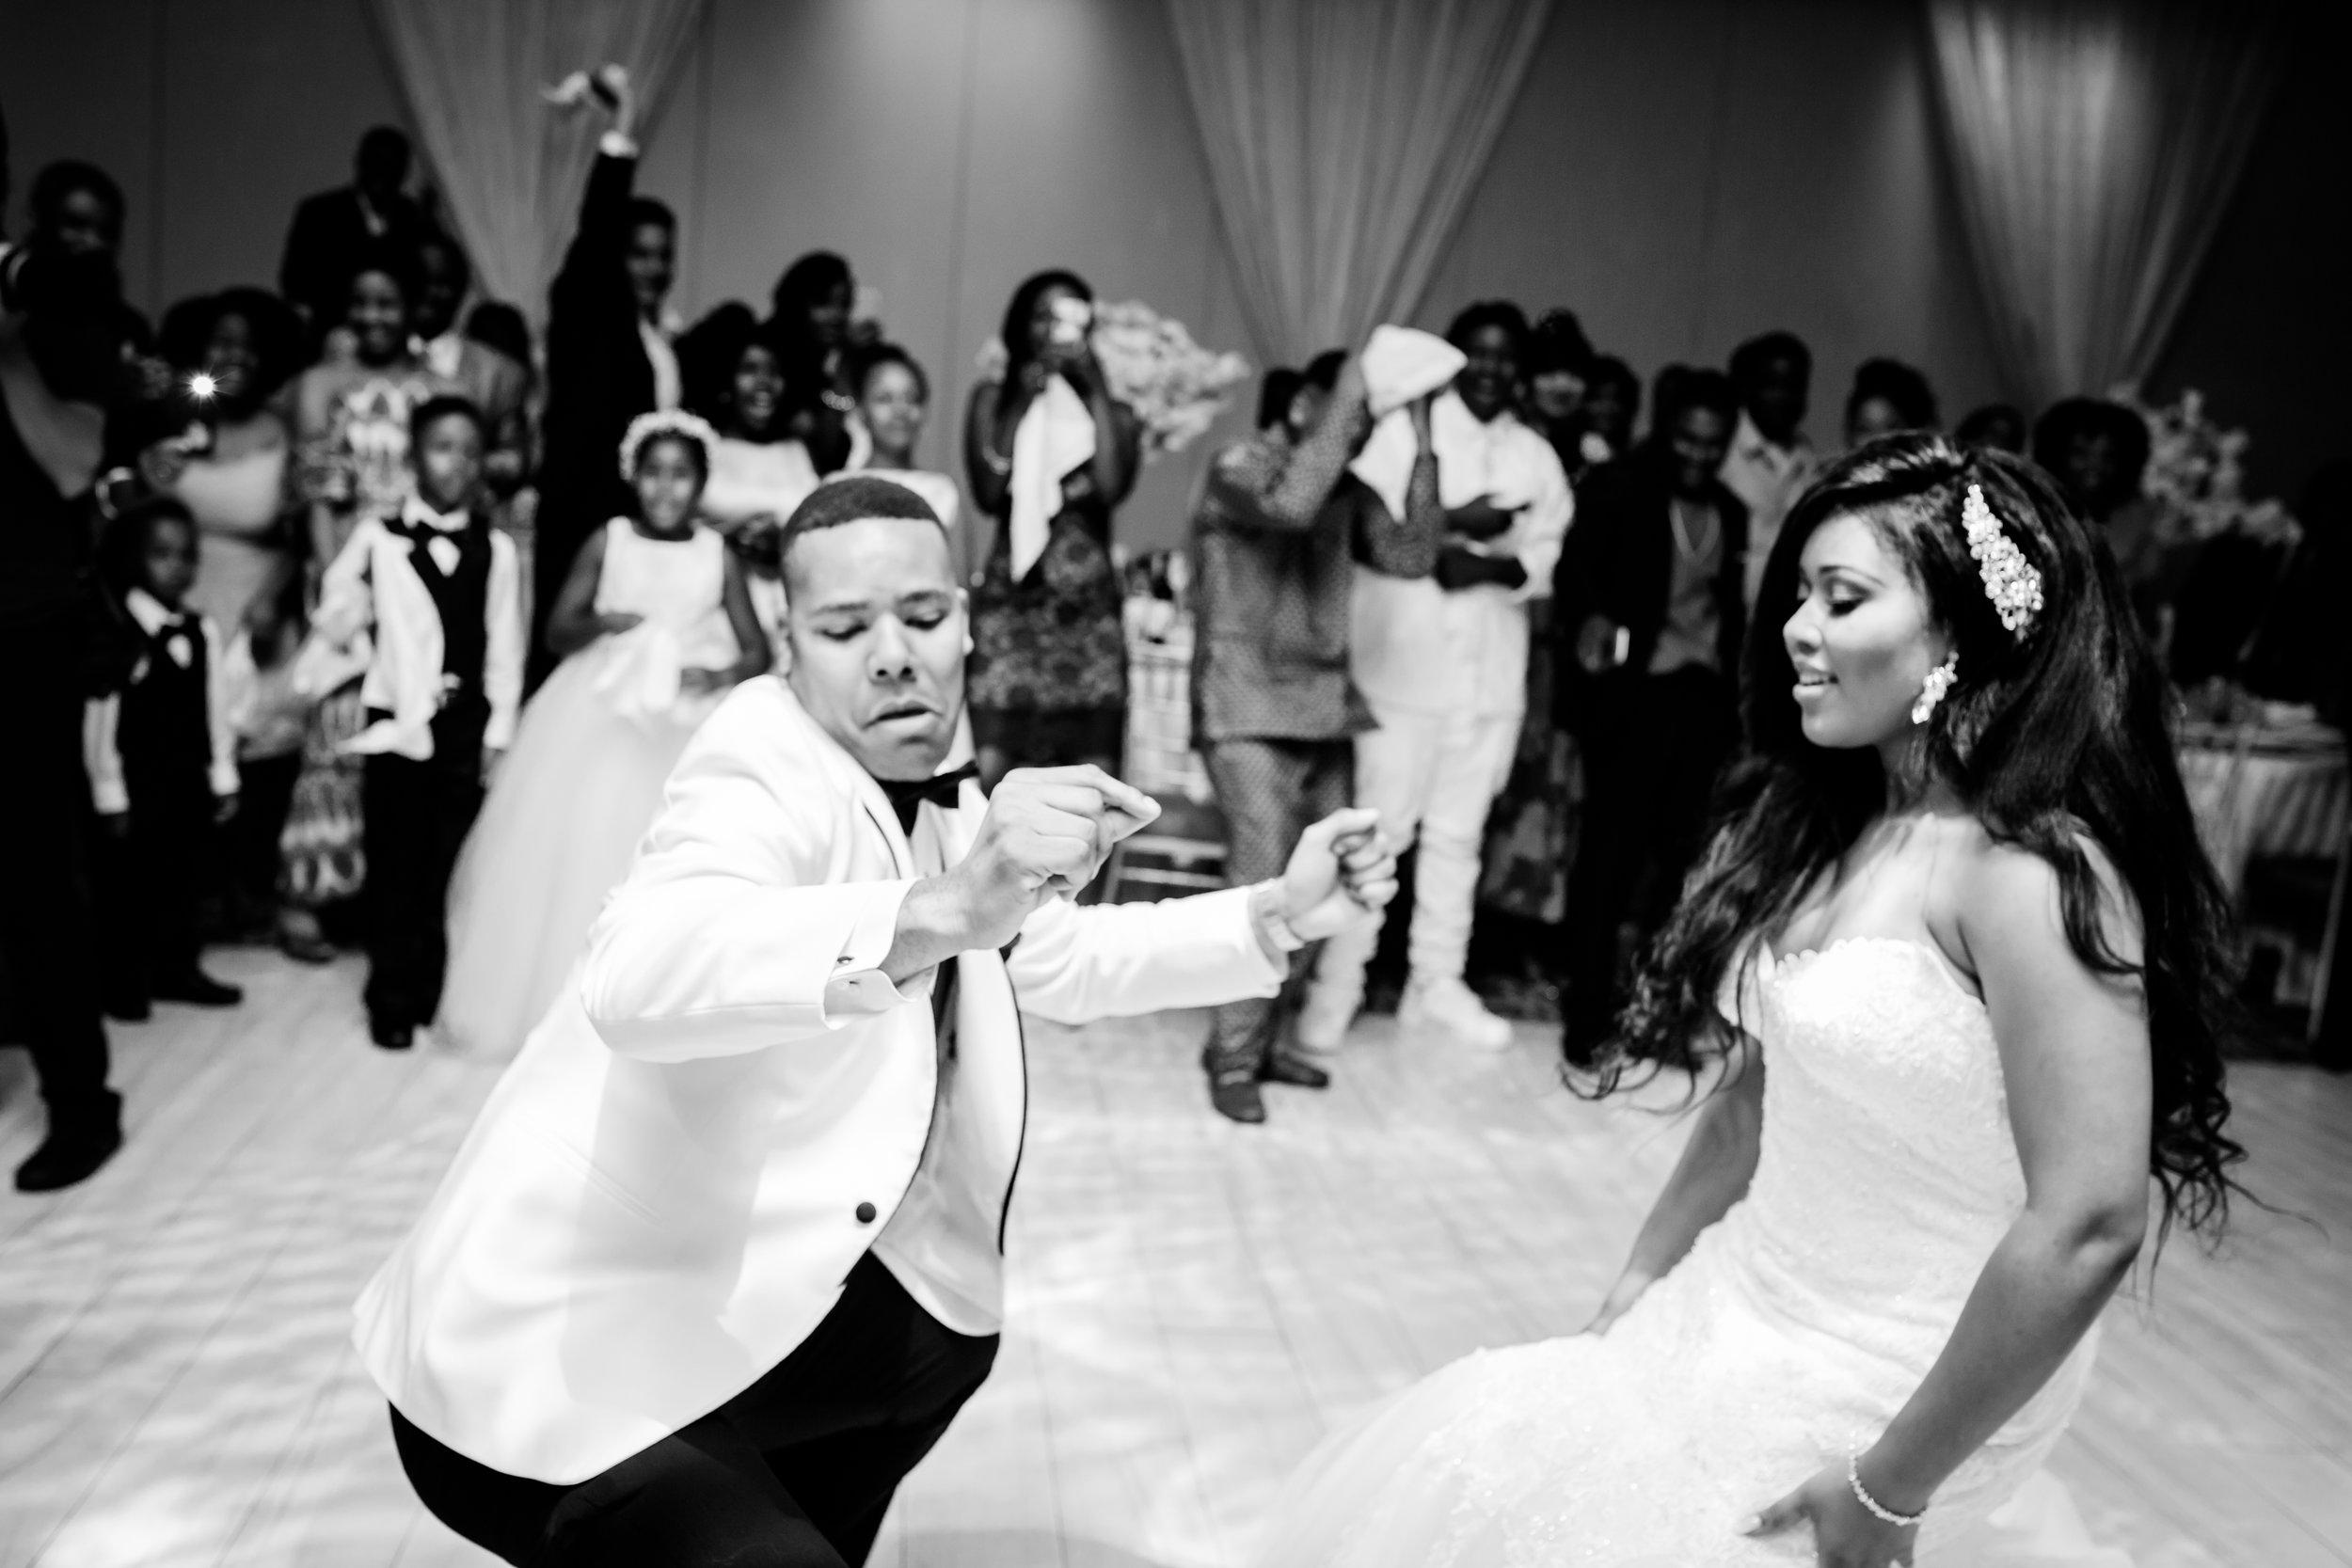 Lavinia_Carl_Wedding_Paradise_Banquet_Hall_Karimah_Gheddai_Photography_4